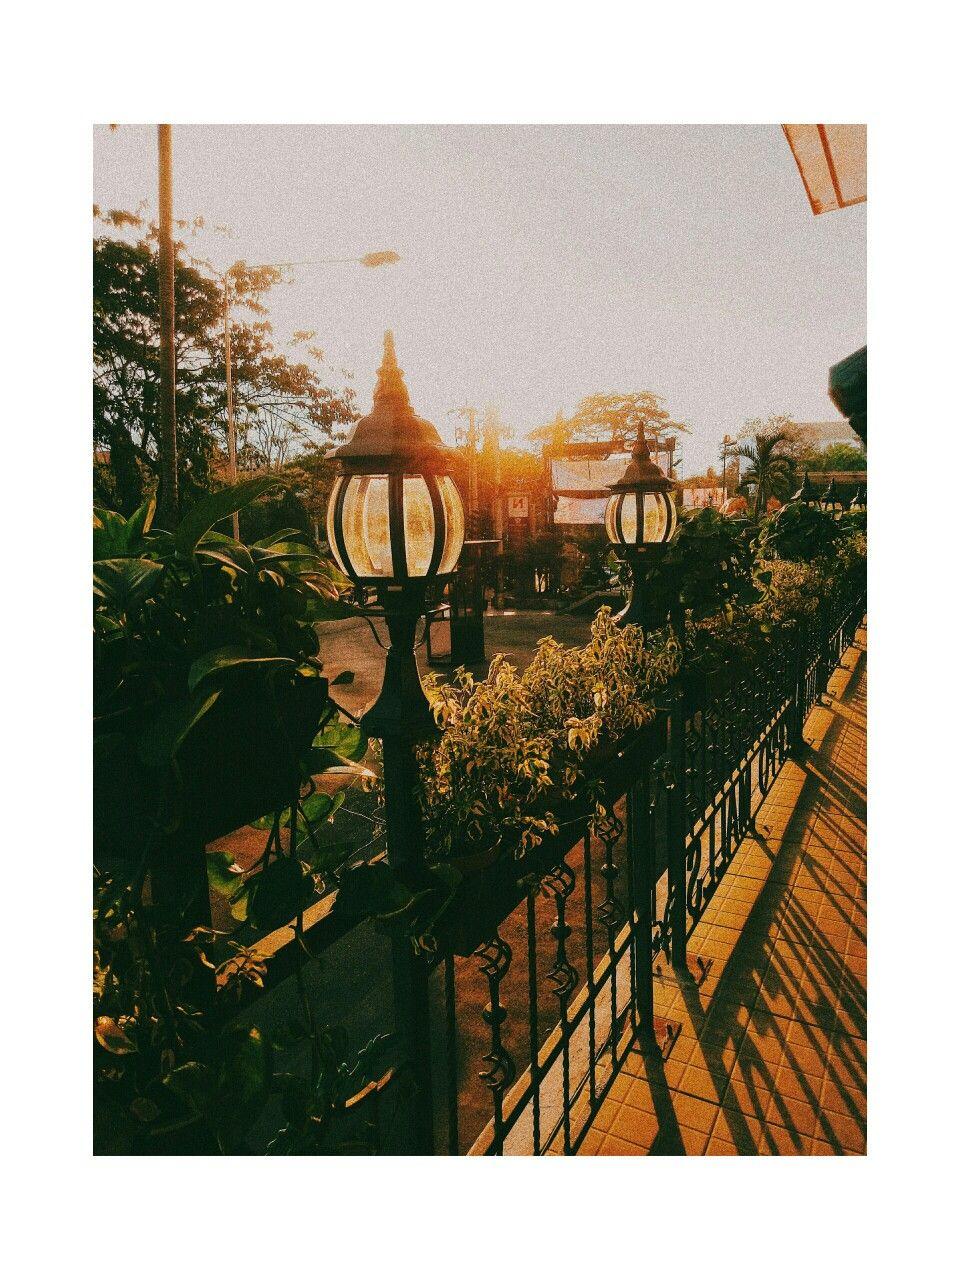 Beautiful sunset 🌅 MXMALL MALANG EASTJAVA INDONESIA